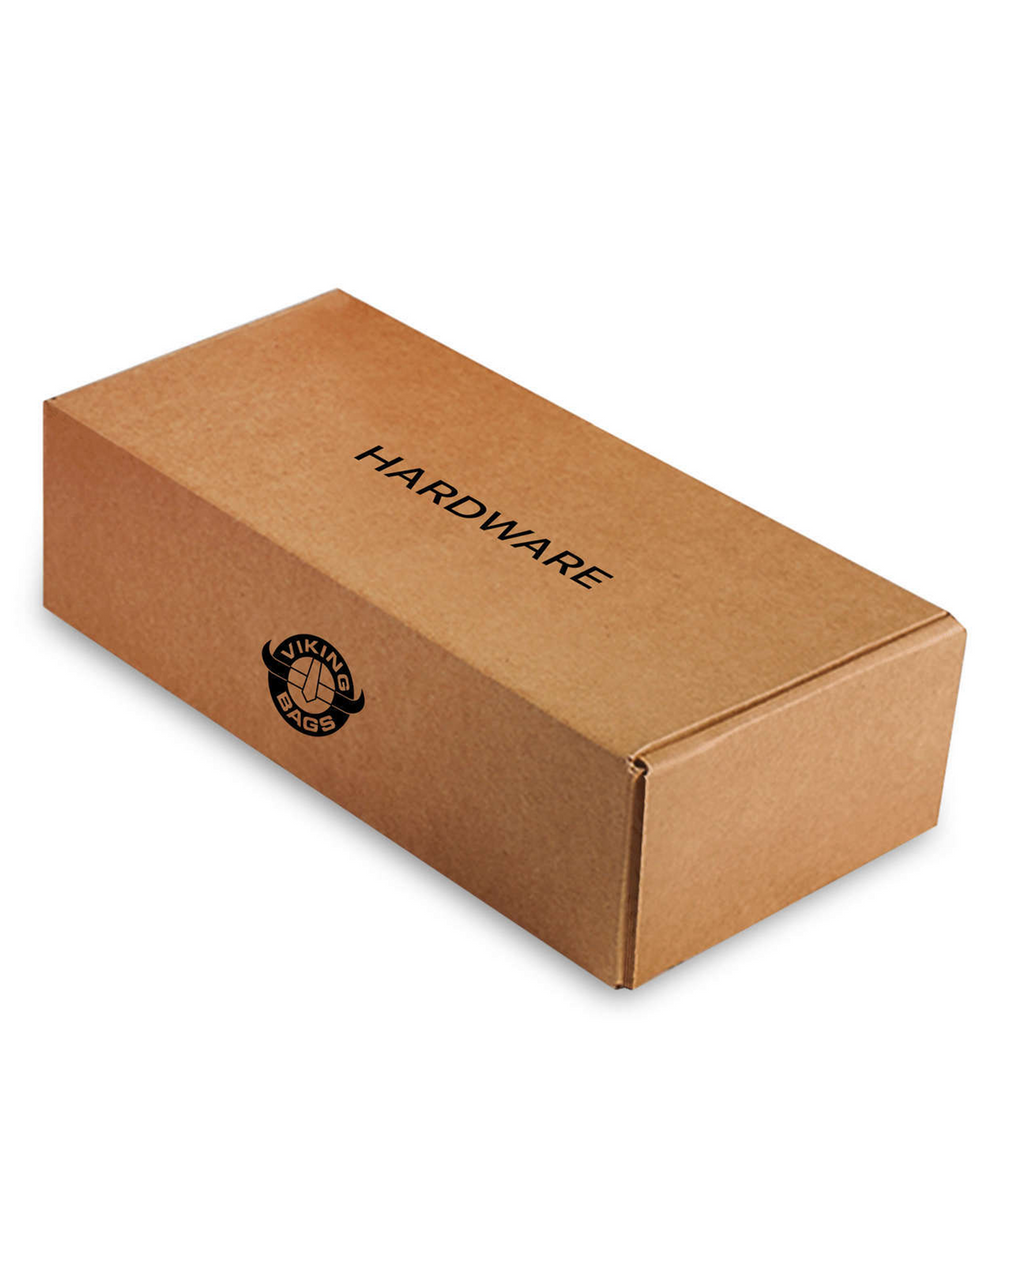 Honda VTX 1800 S Lamellar Extra Large Shock Cutout Leather Covered Saddlebag box